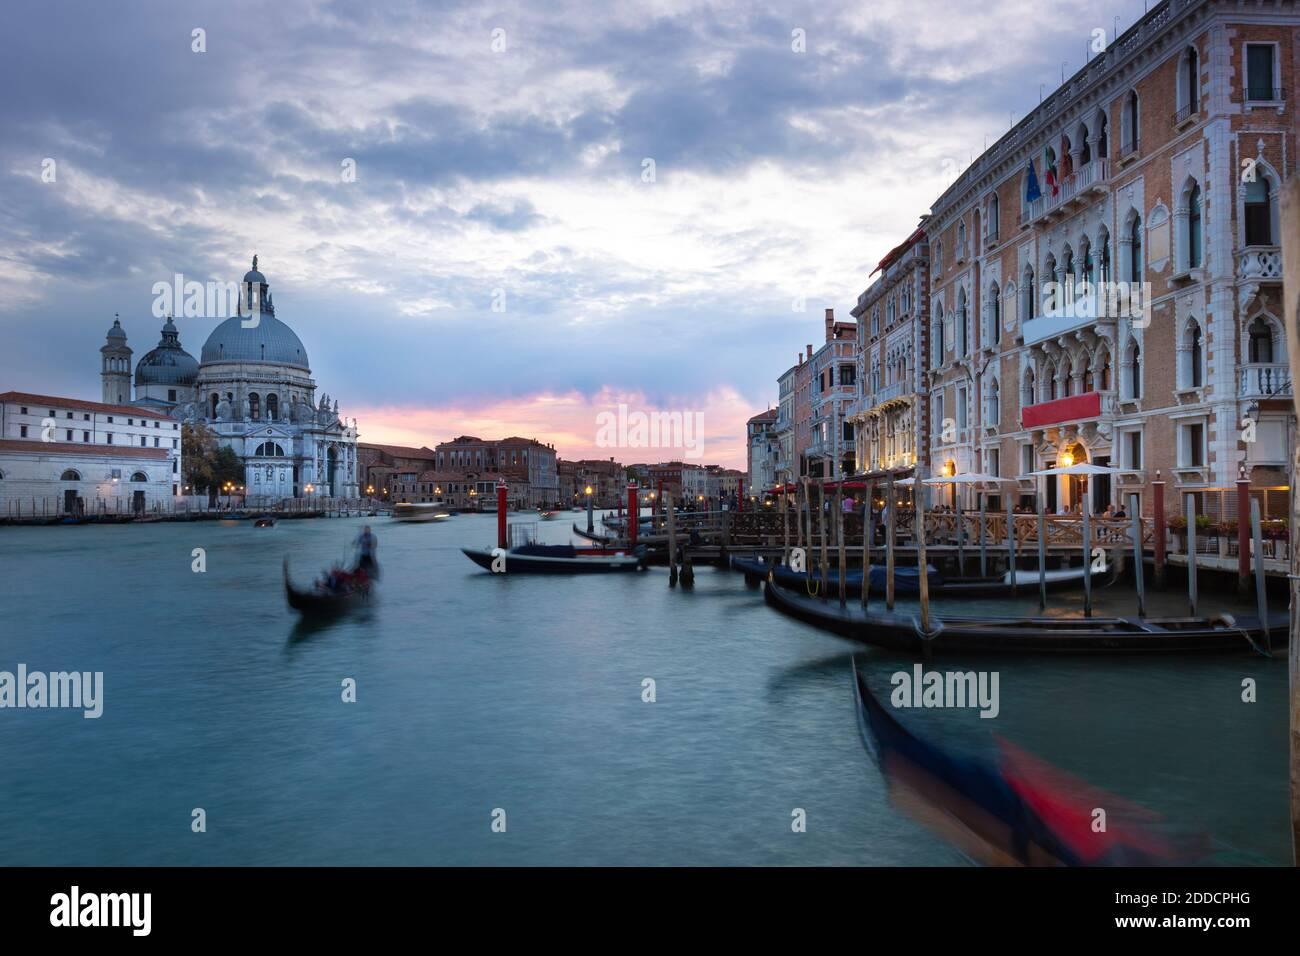 Italien, Venetien, Venedig, Gondeln in Marina vor Santa Maria della Salute in der Abenddämmerung Stockfoto